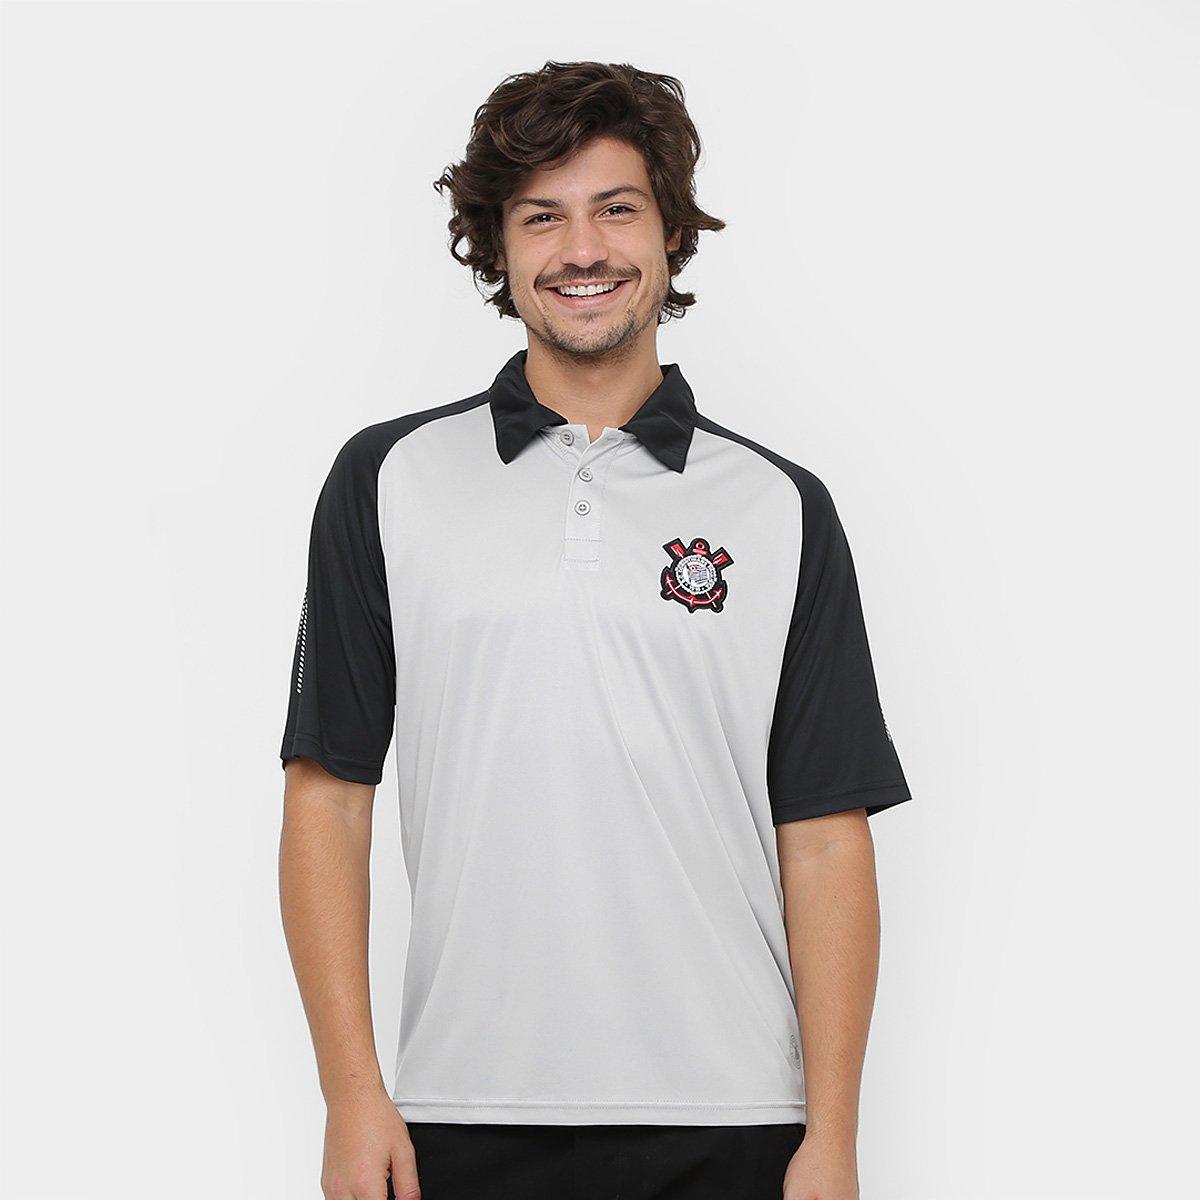 d8a90abc51a40 Camisa Polo Corinthians Bicampeão Mundial Masculina - Compre Agora ...